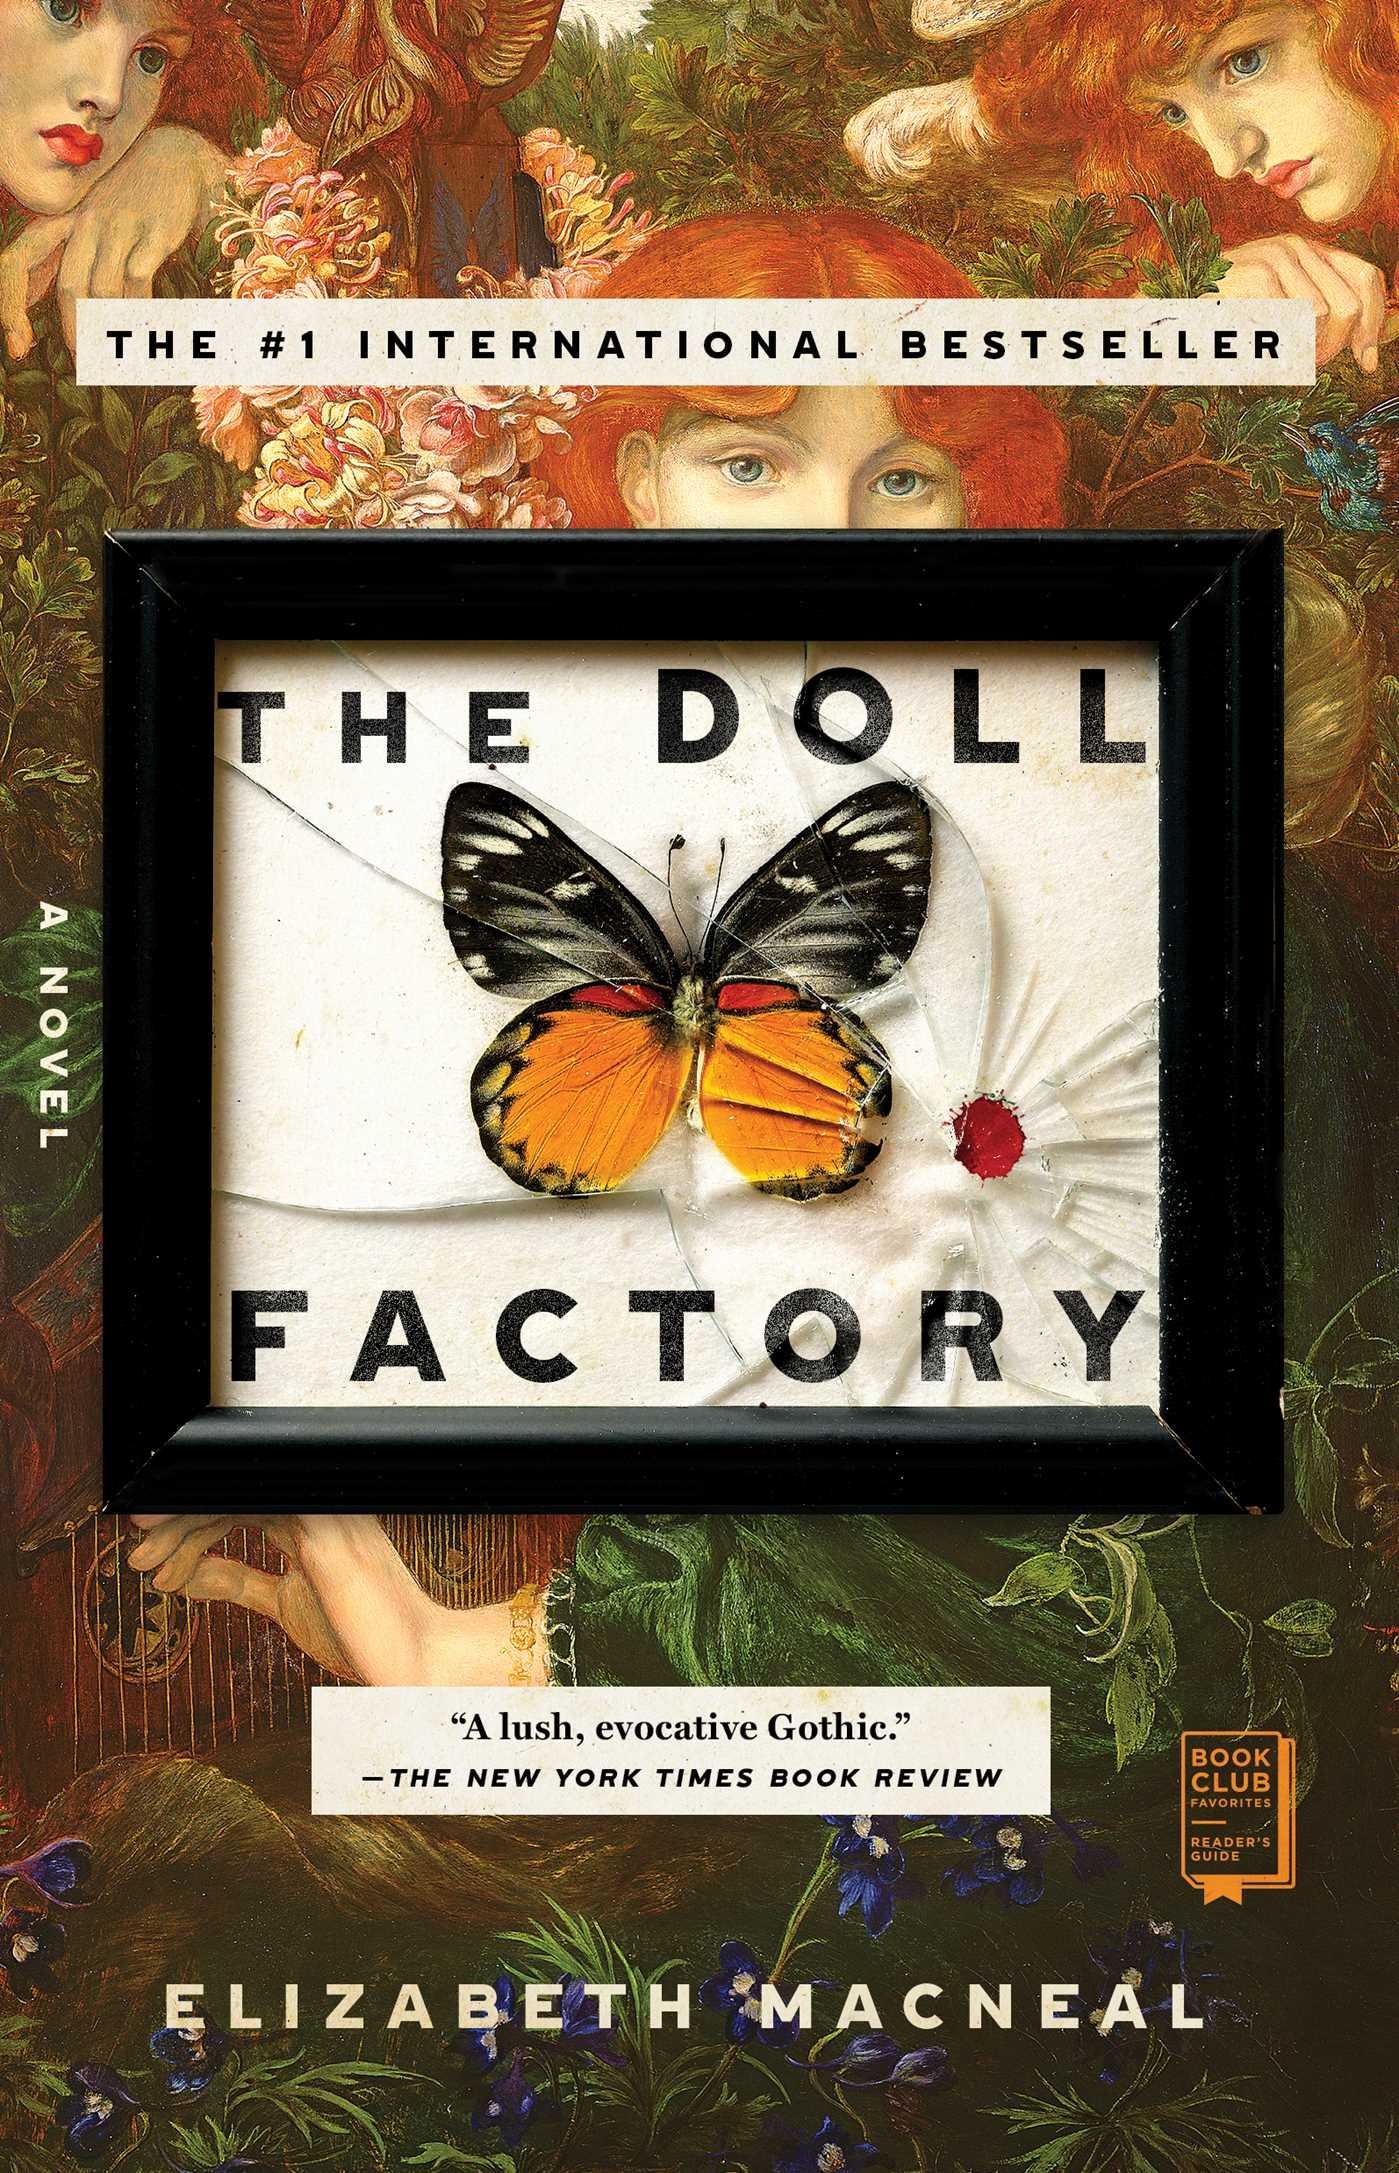 The Doll FactorybyElizabeth Macneal